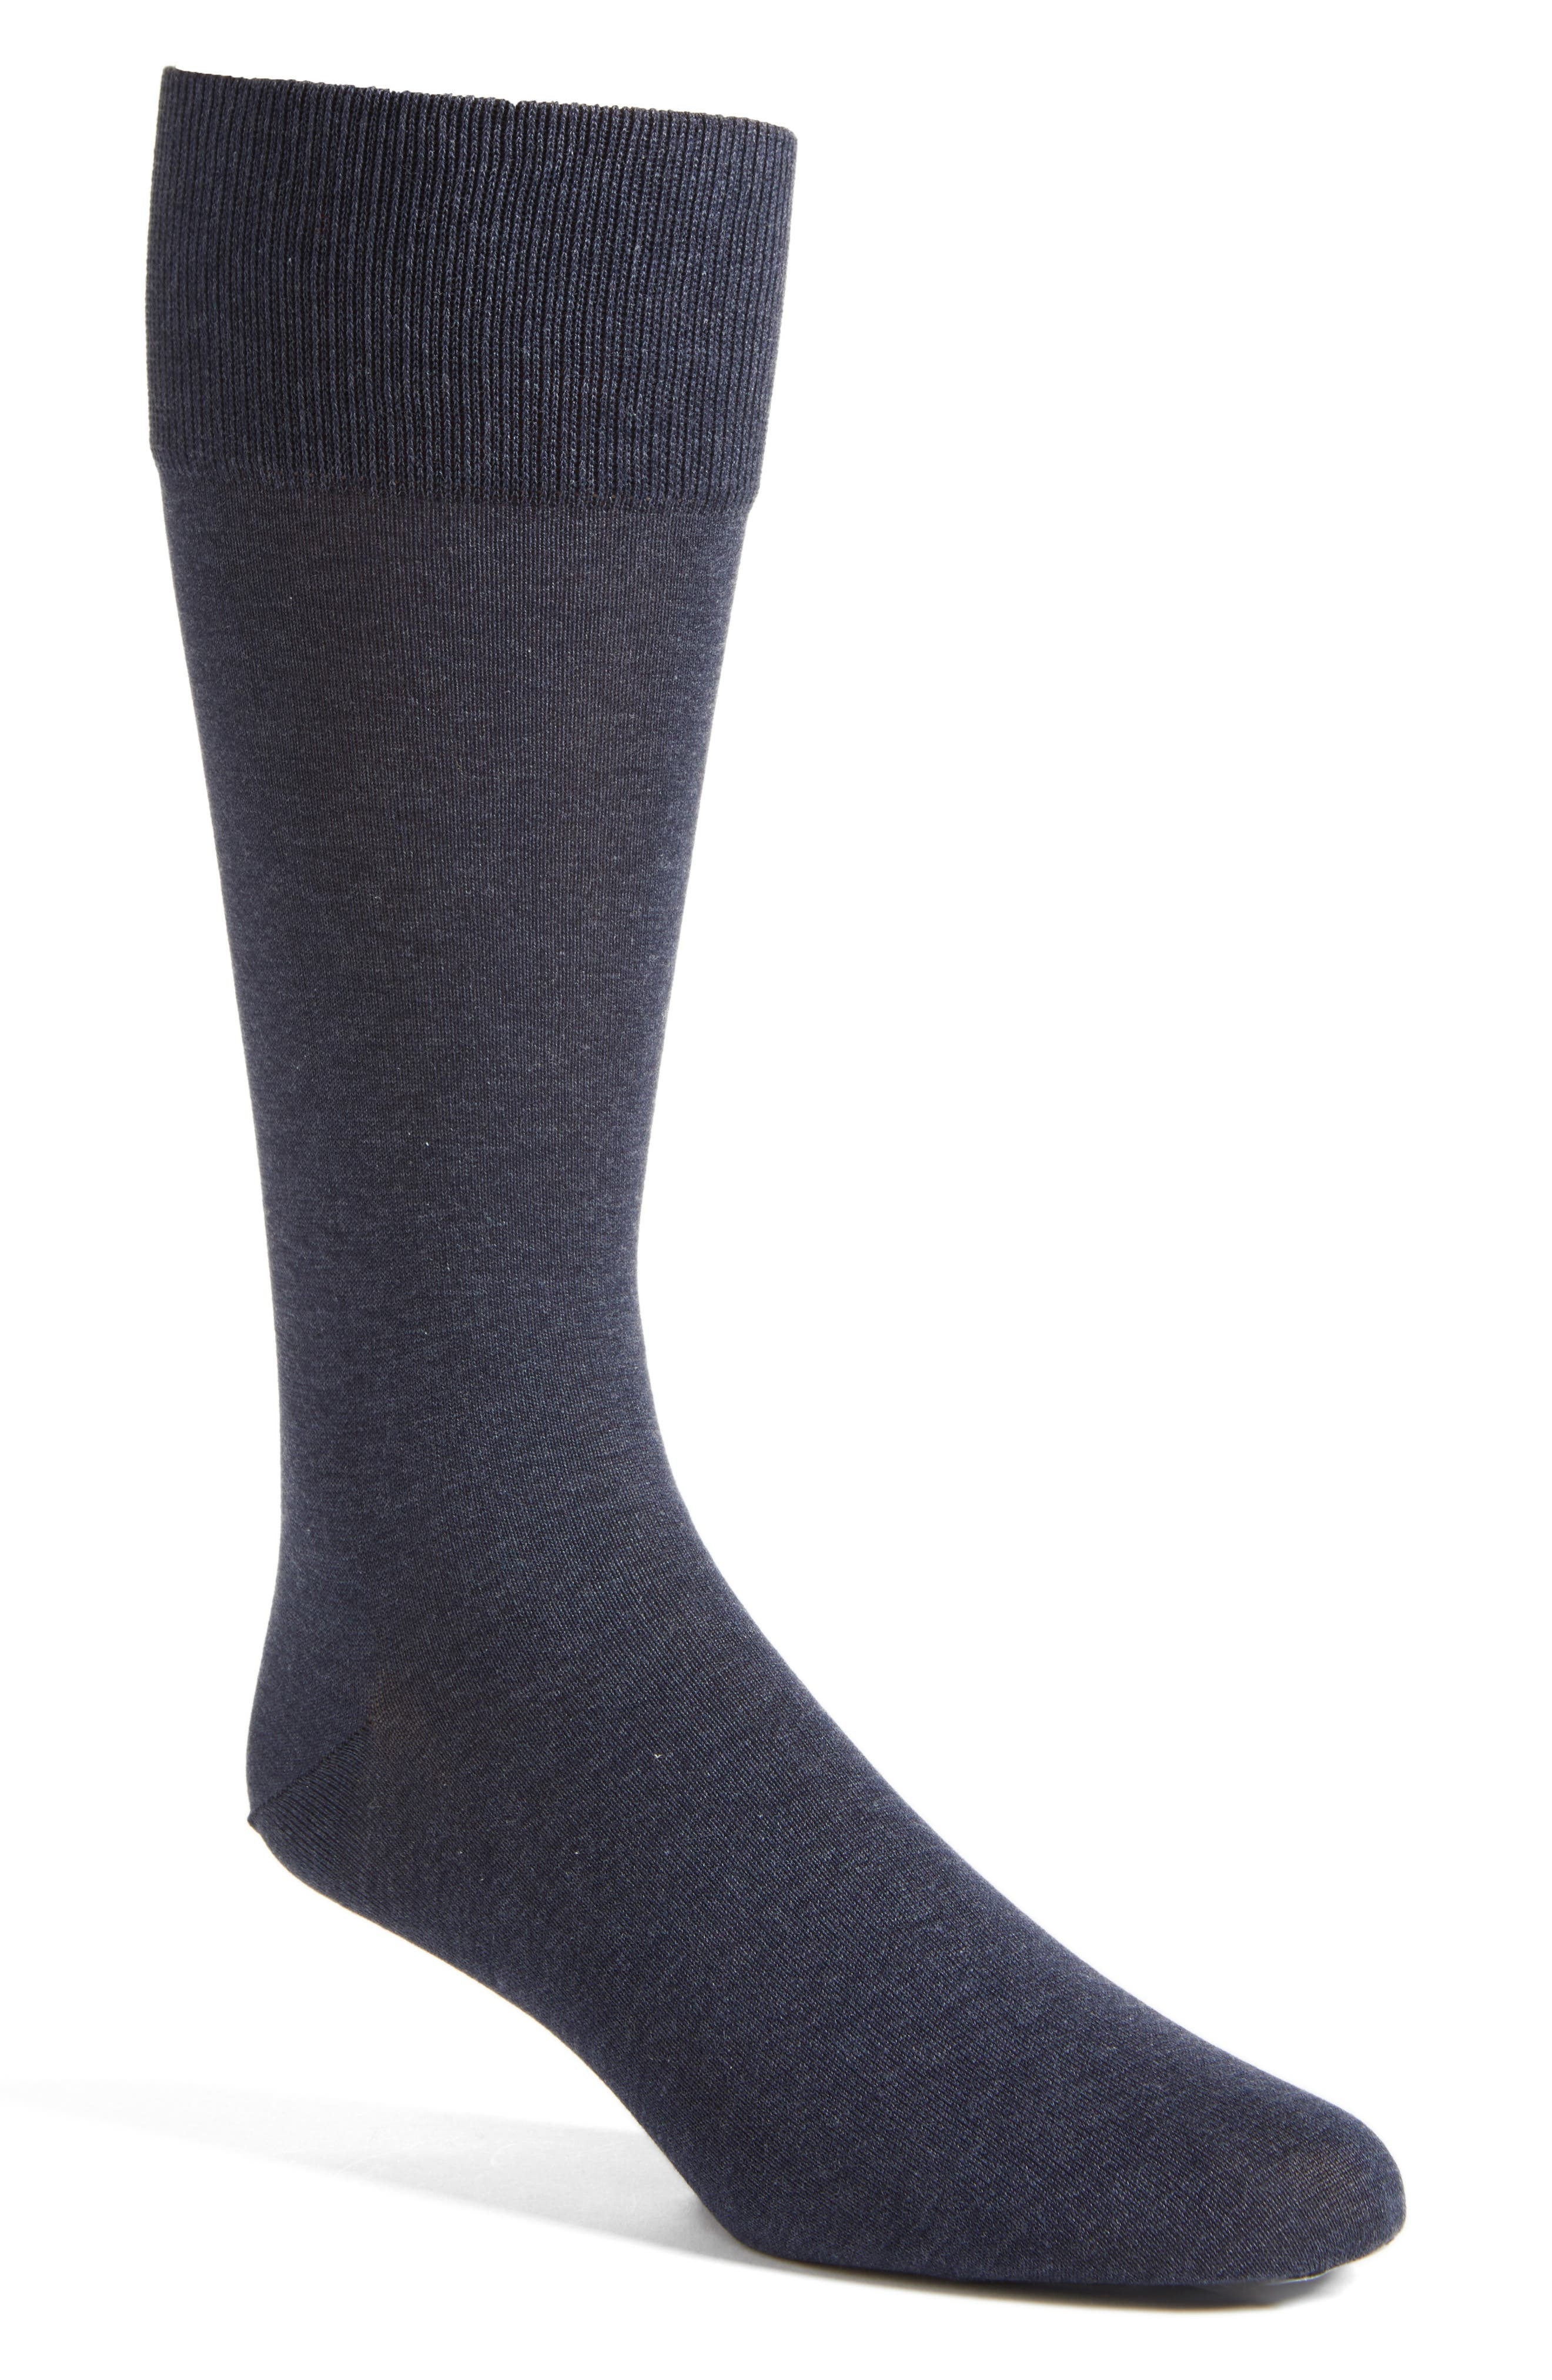 Solid Socks,                             Main thumbnail 1, color,                             CHARCOAL HEATHER